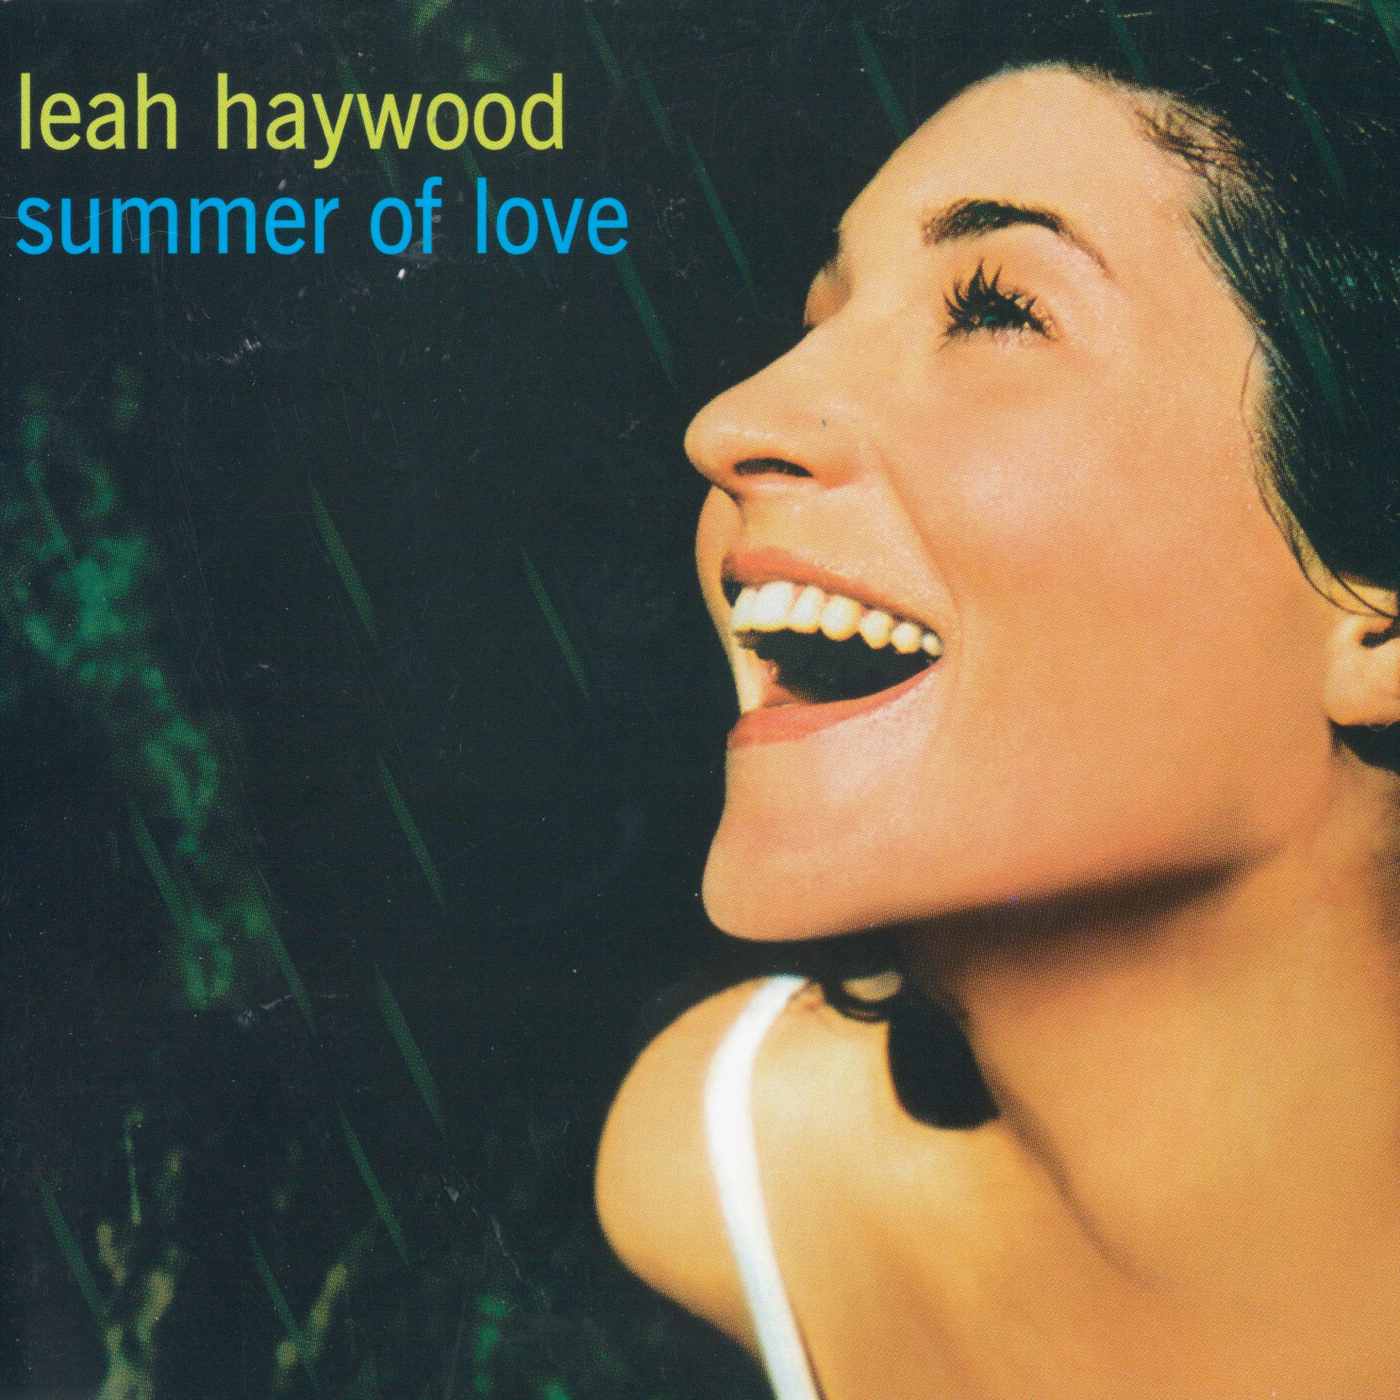 Summer Of Love - Leah Haywood